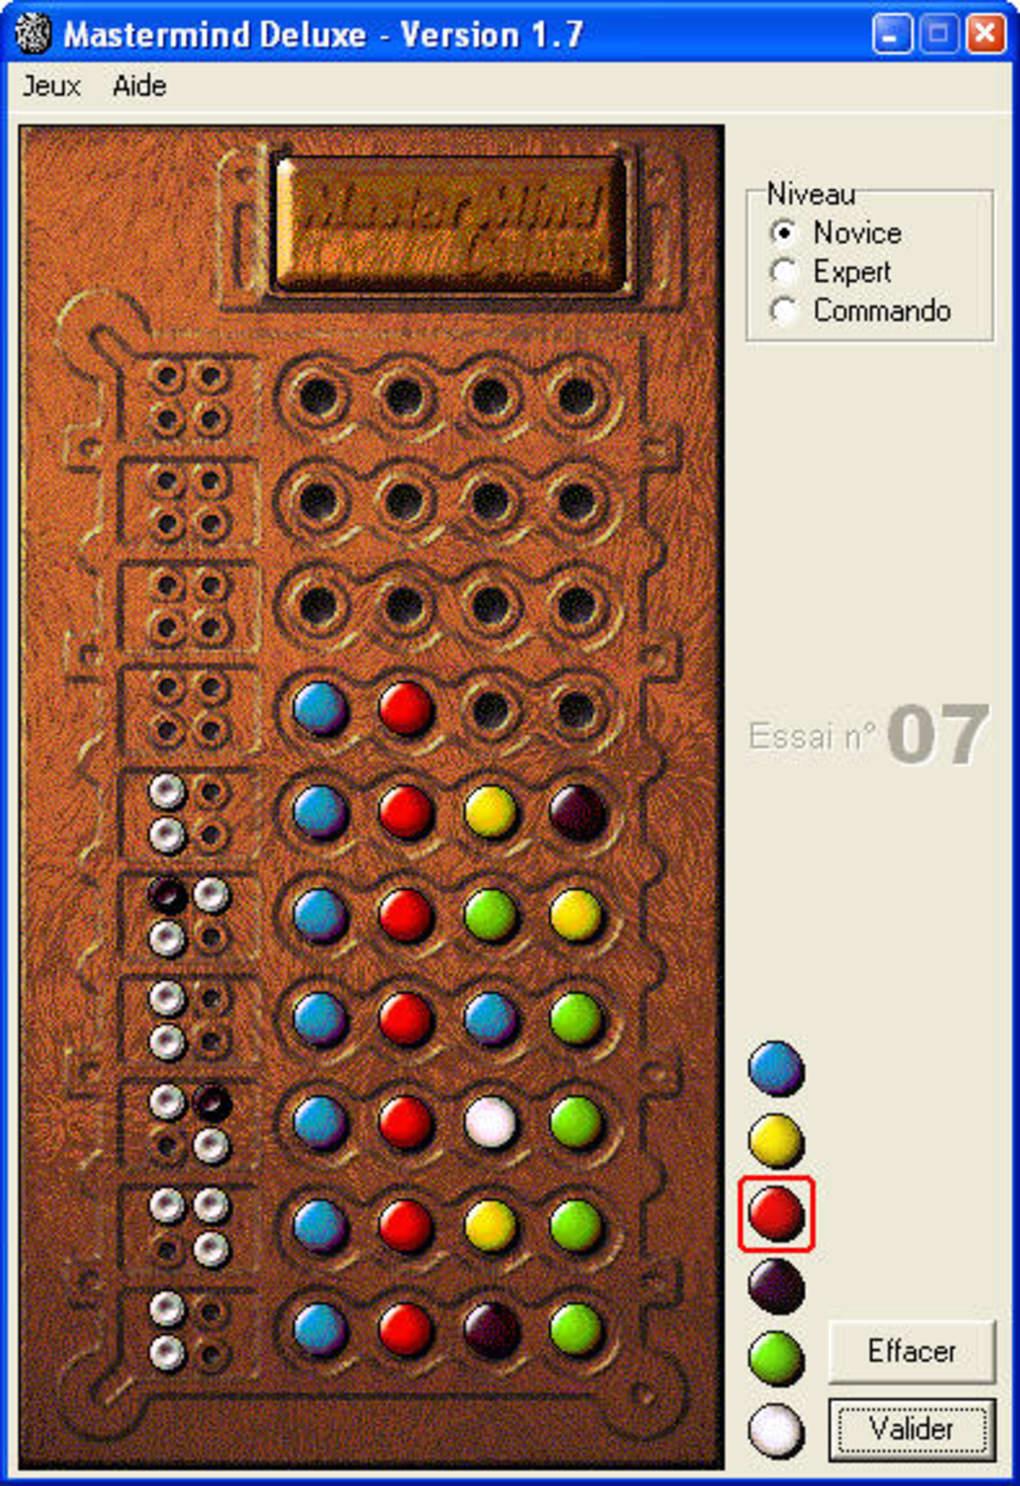 Scrabble Windows 7